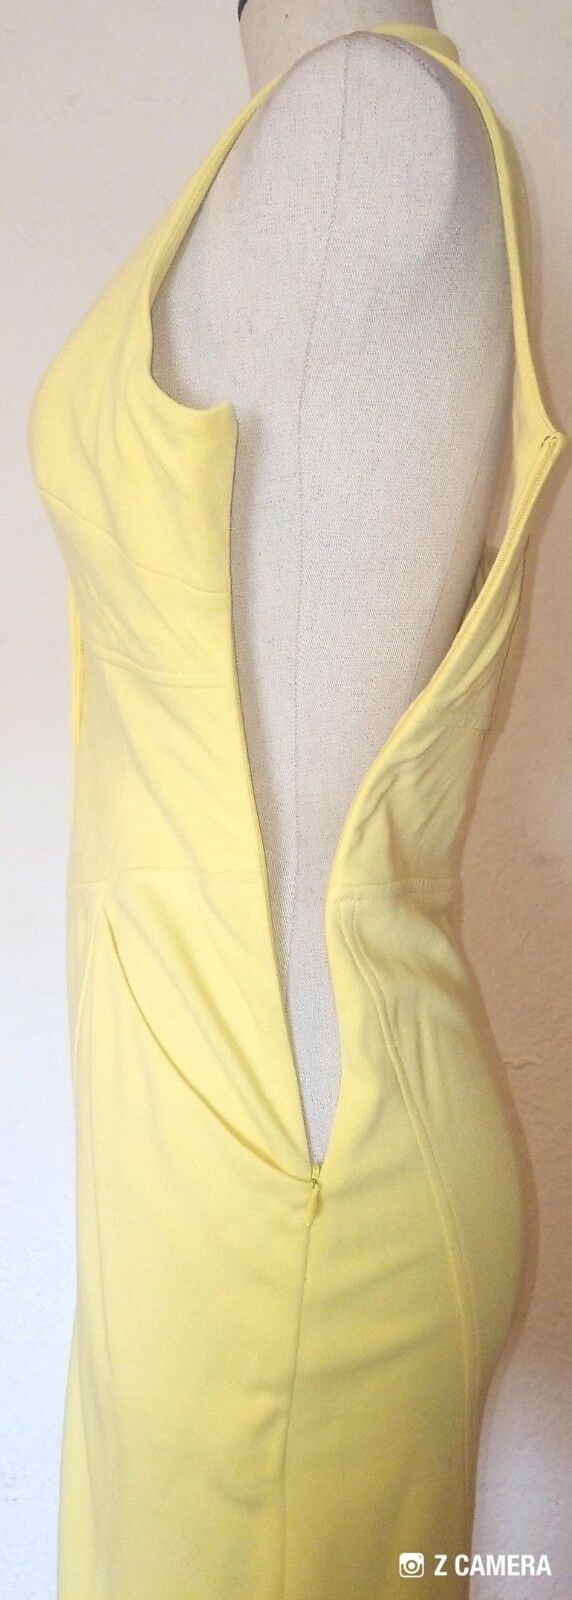 Catherine Malandrino Bright Yellow Dress Size S  - image 4